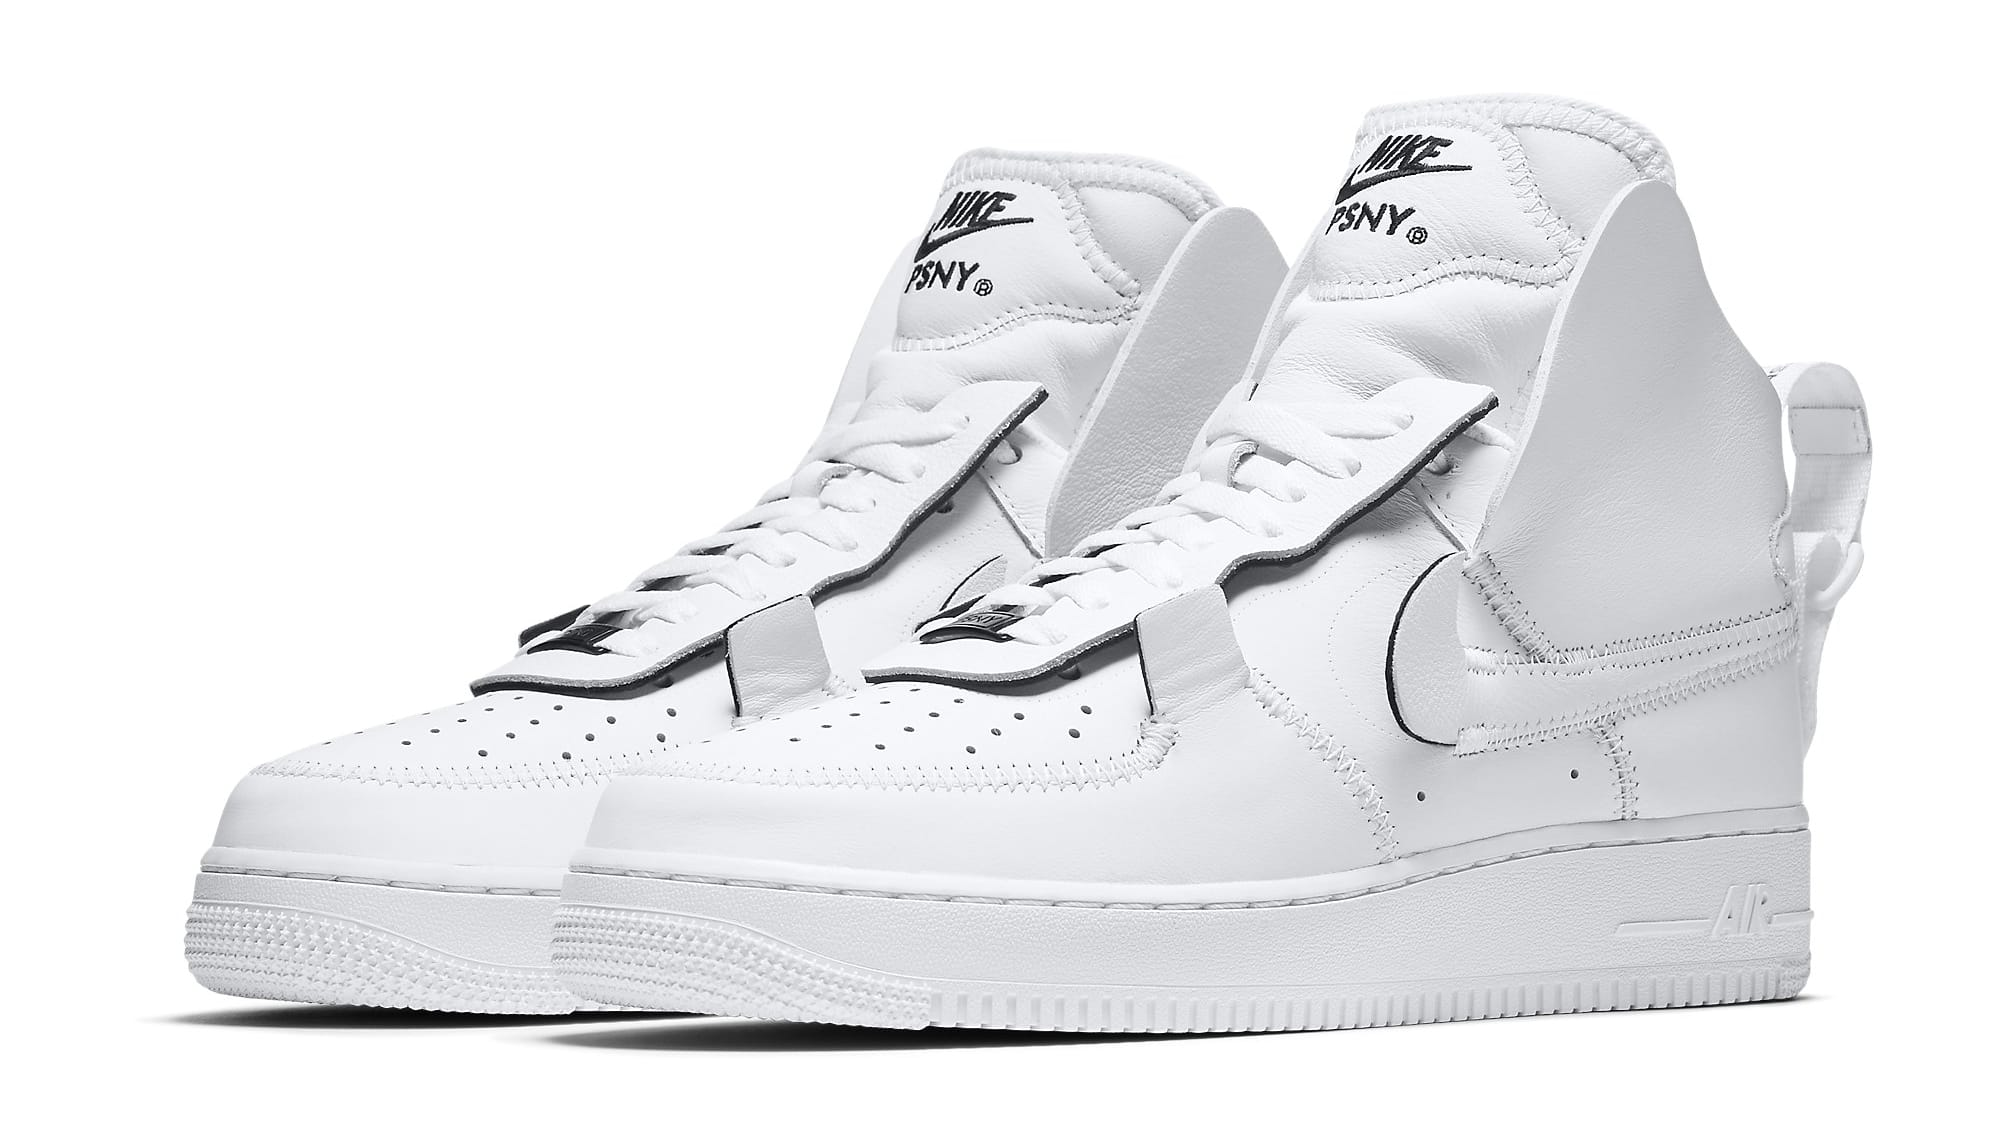 PSNY x Nike Air Force 1 High Black White Wolf Grey Release